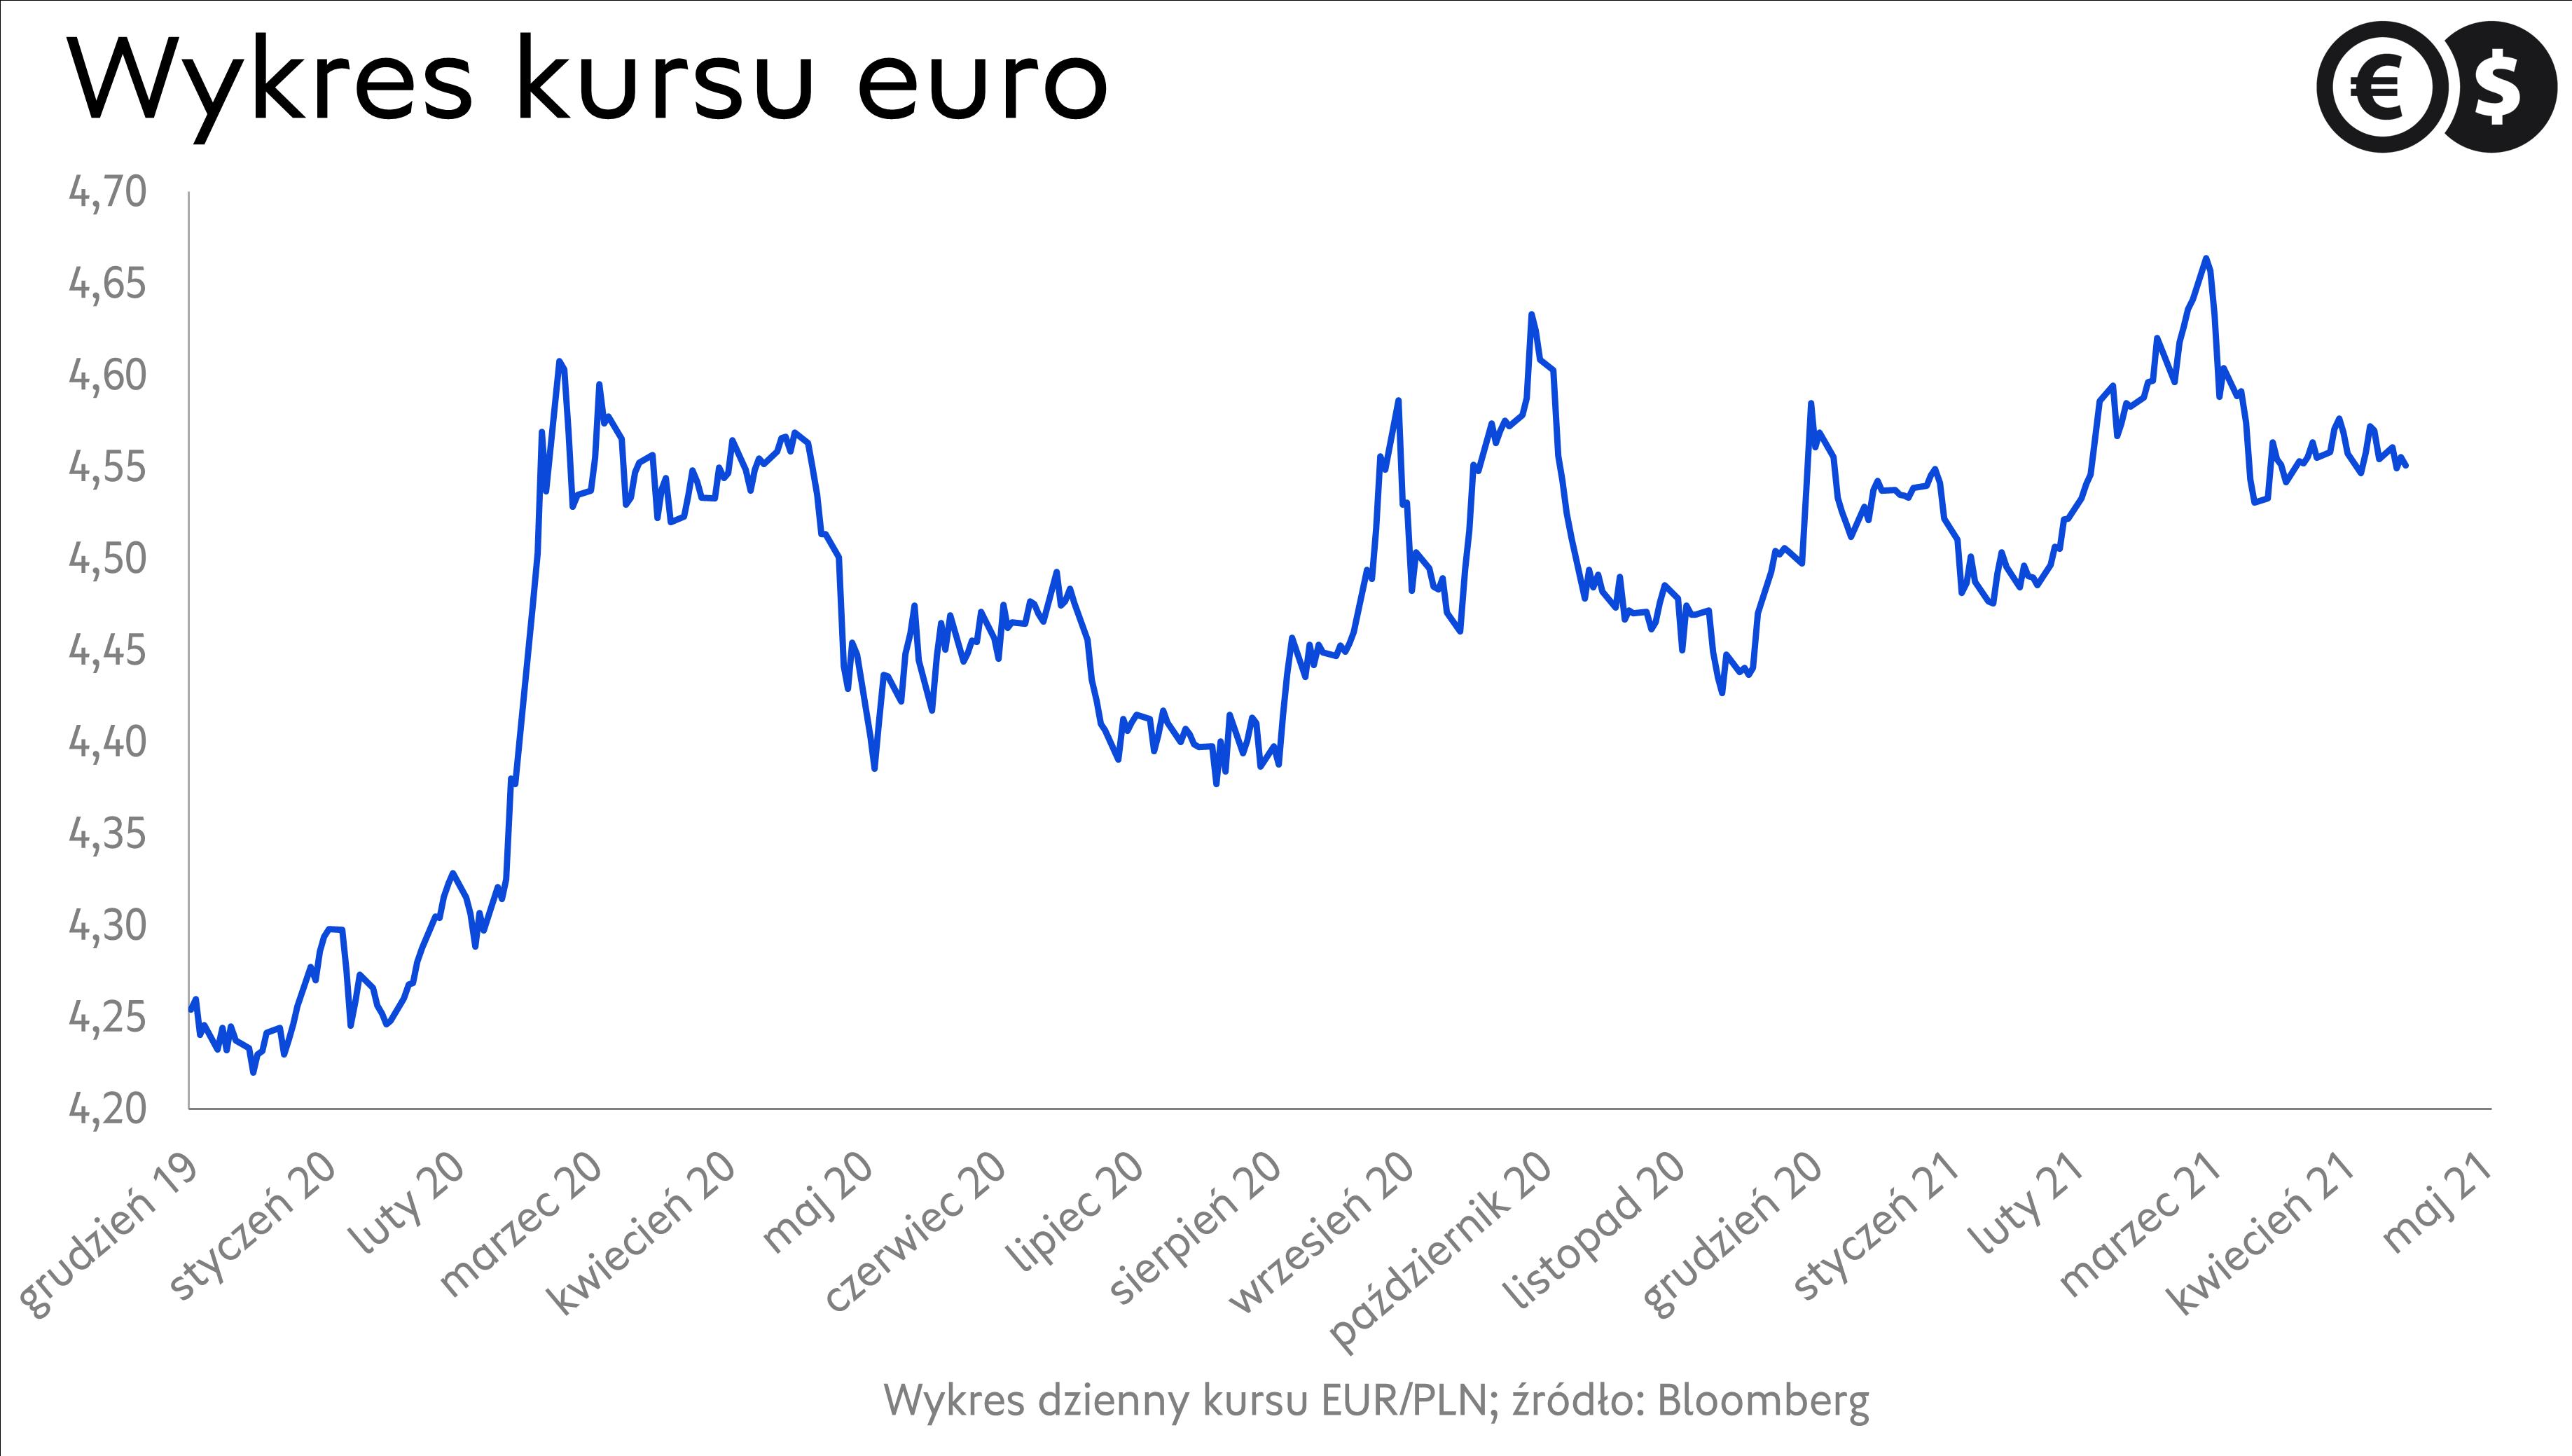 Kurs euro, notowania EUR/PLN; źródło: Bloomberg